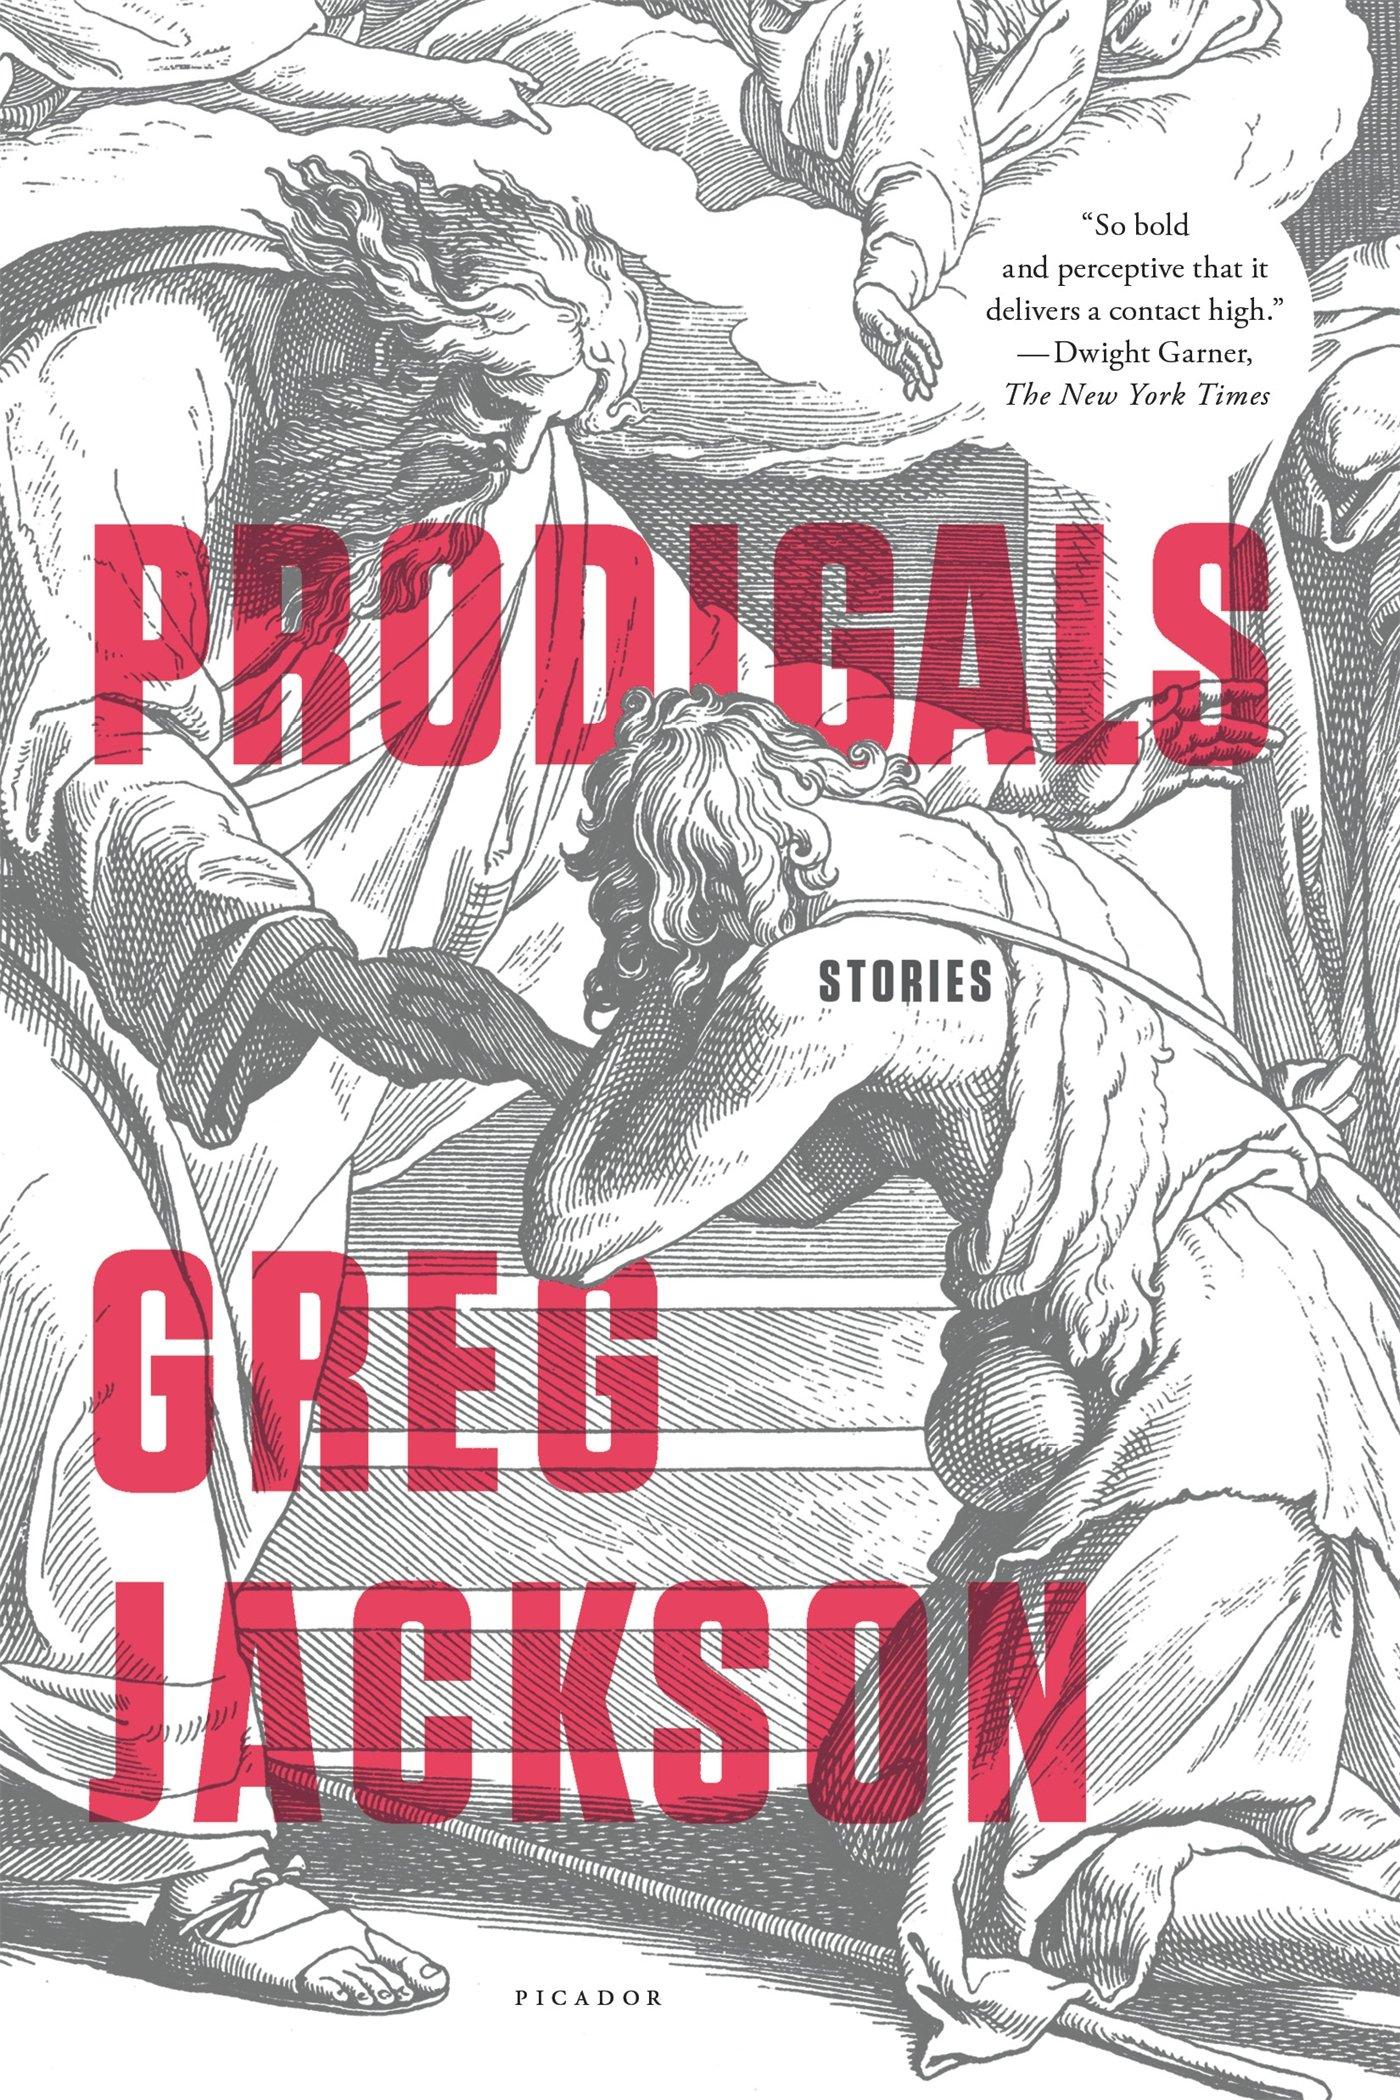 Prodigals stories greg jackson 9781250118059 amazon books fandeluxe Gallery